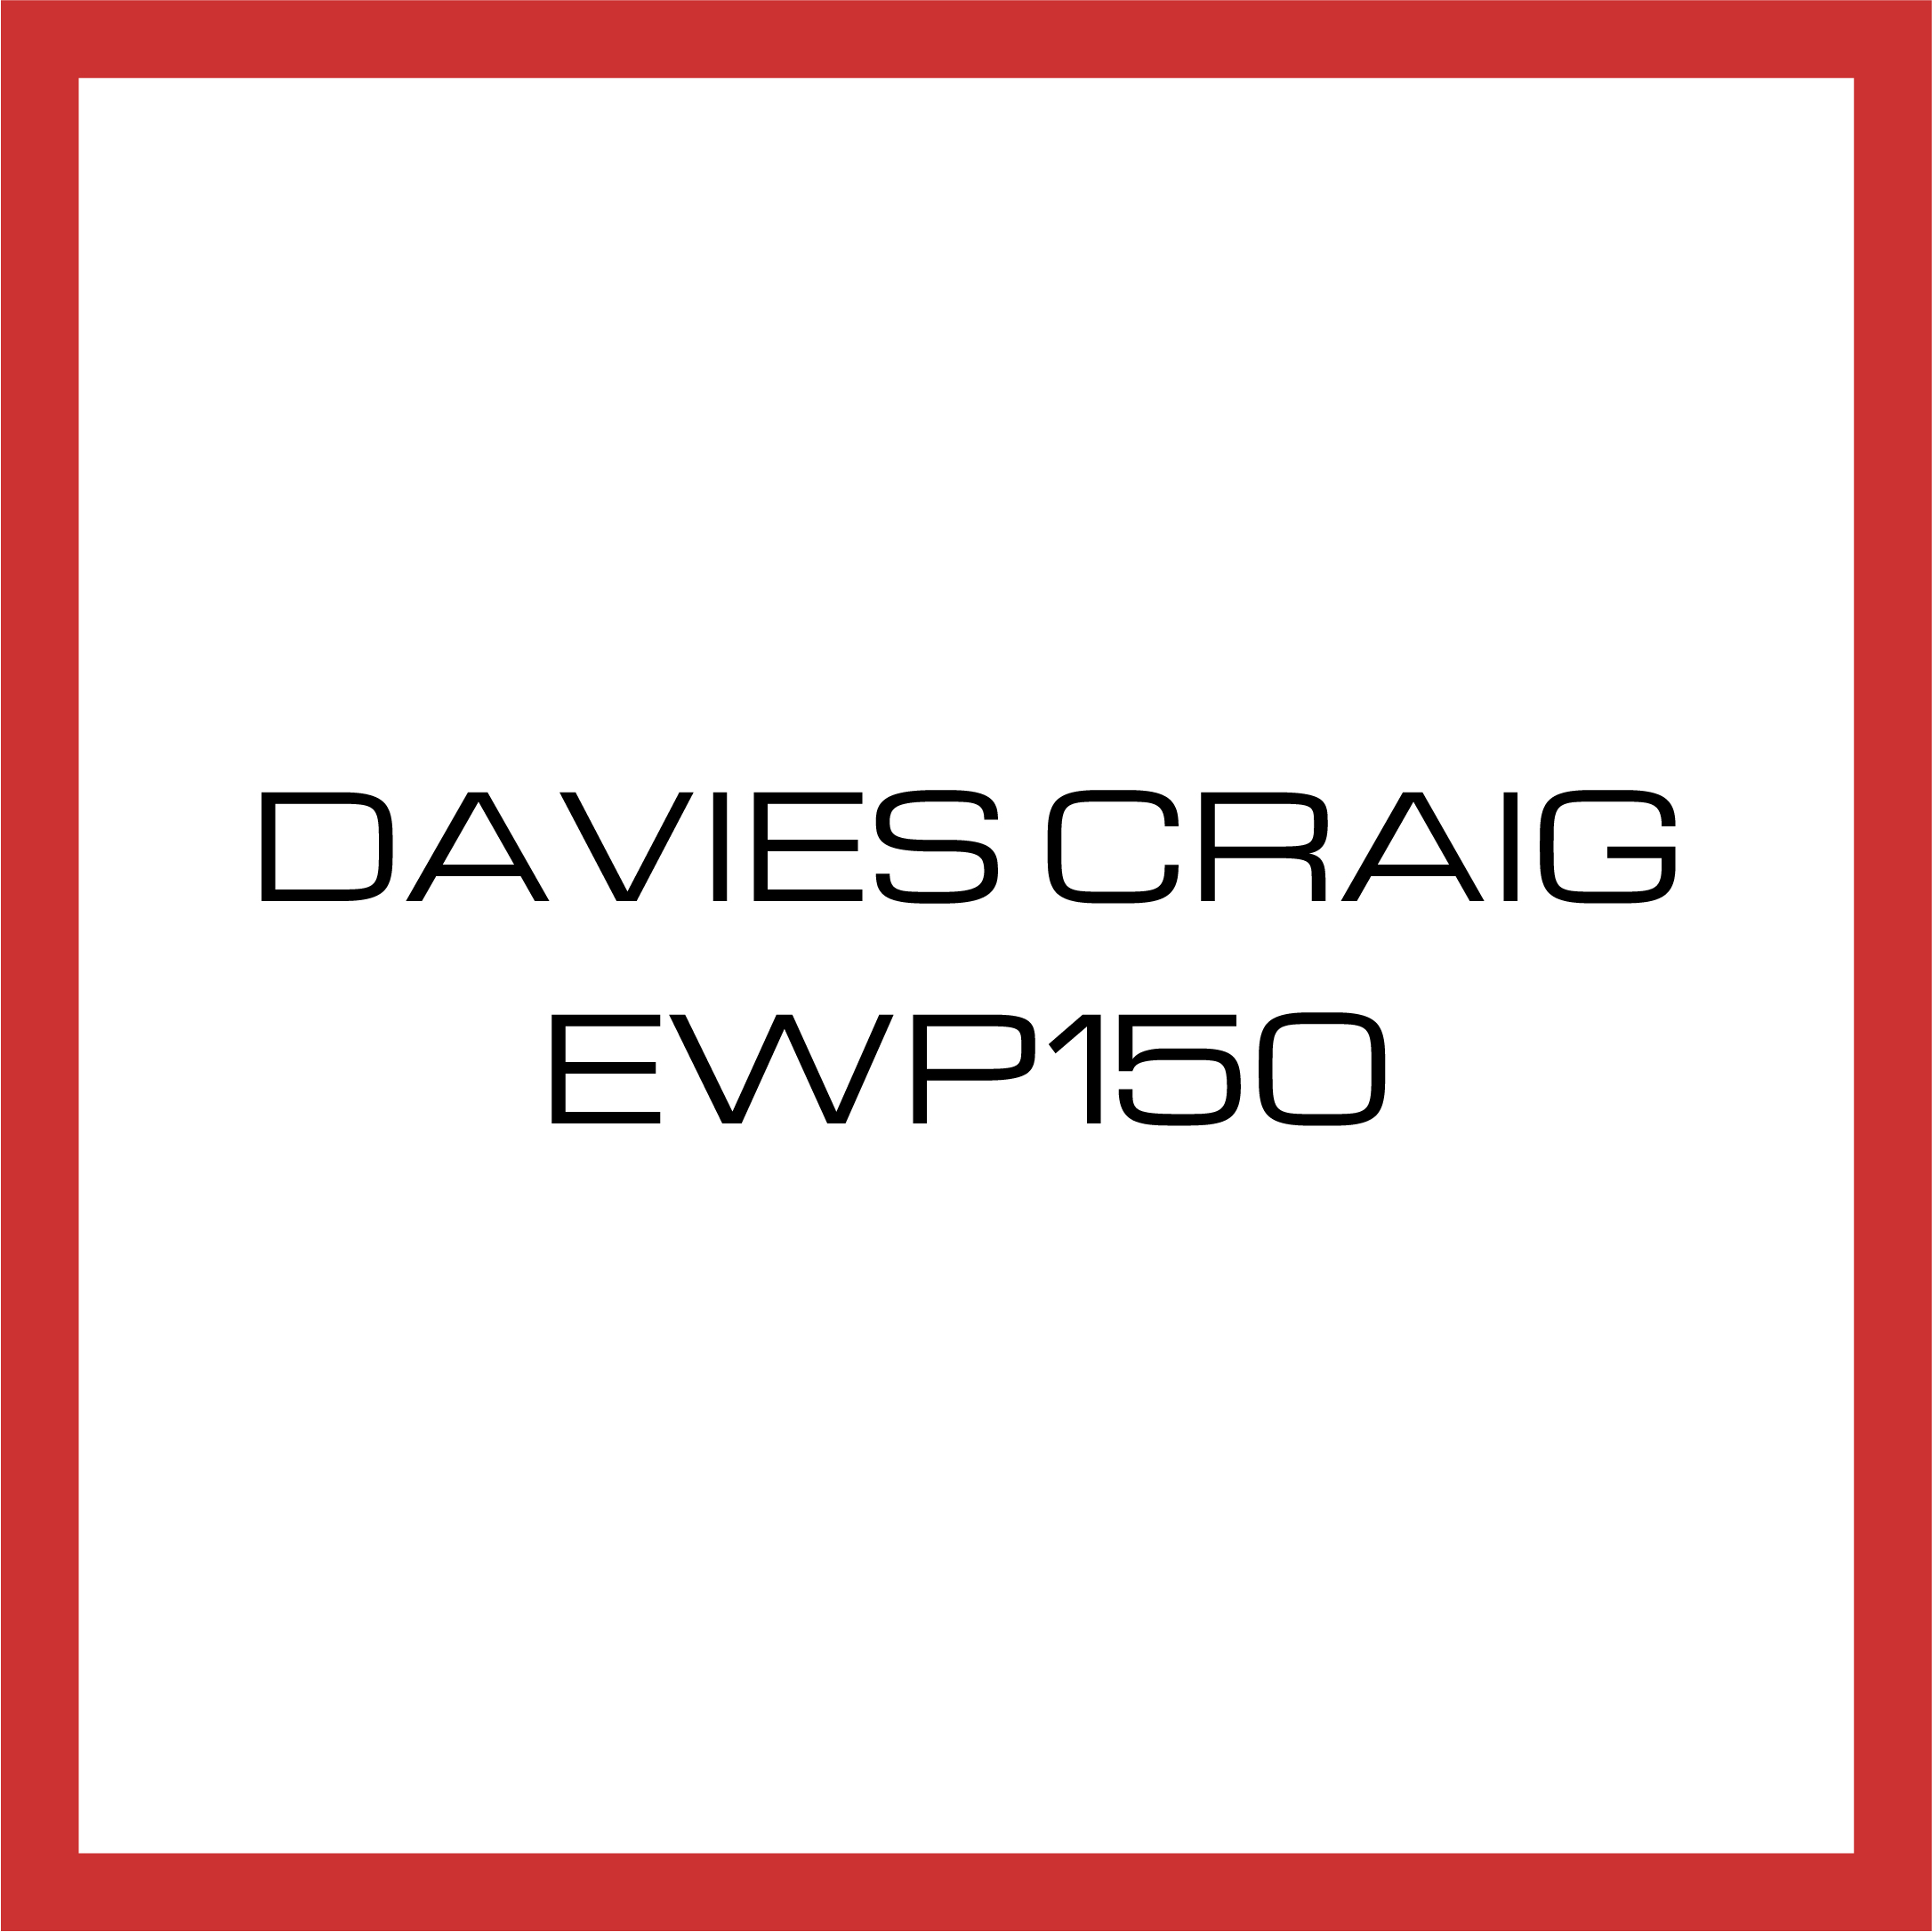 Davies Craig EWP150 Bracket